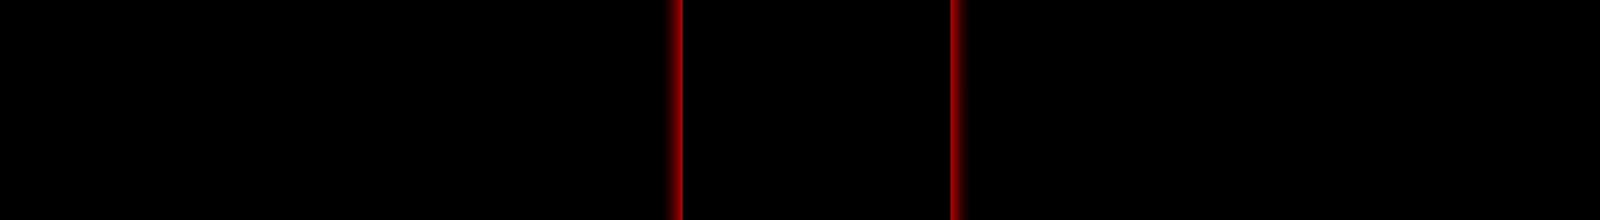 Hamdi1304